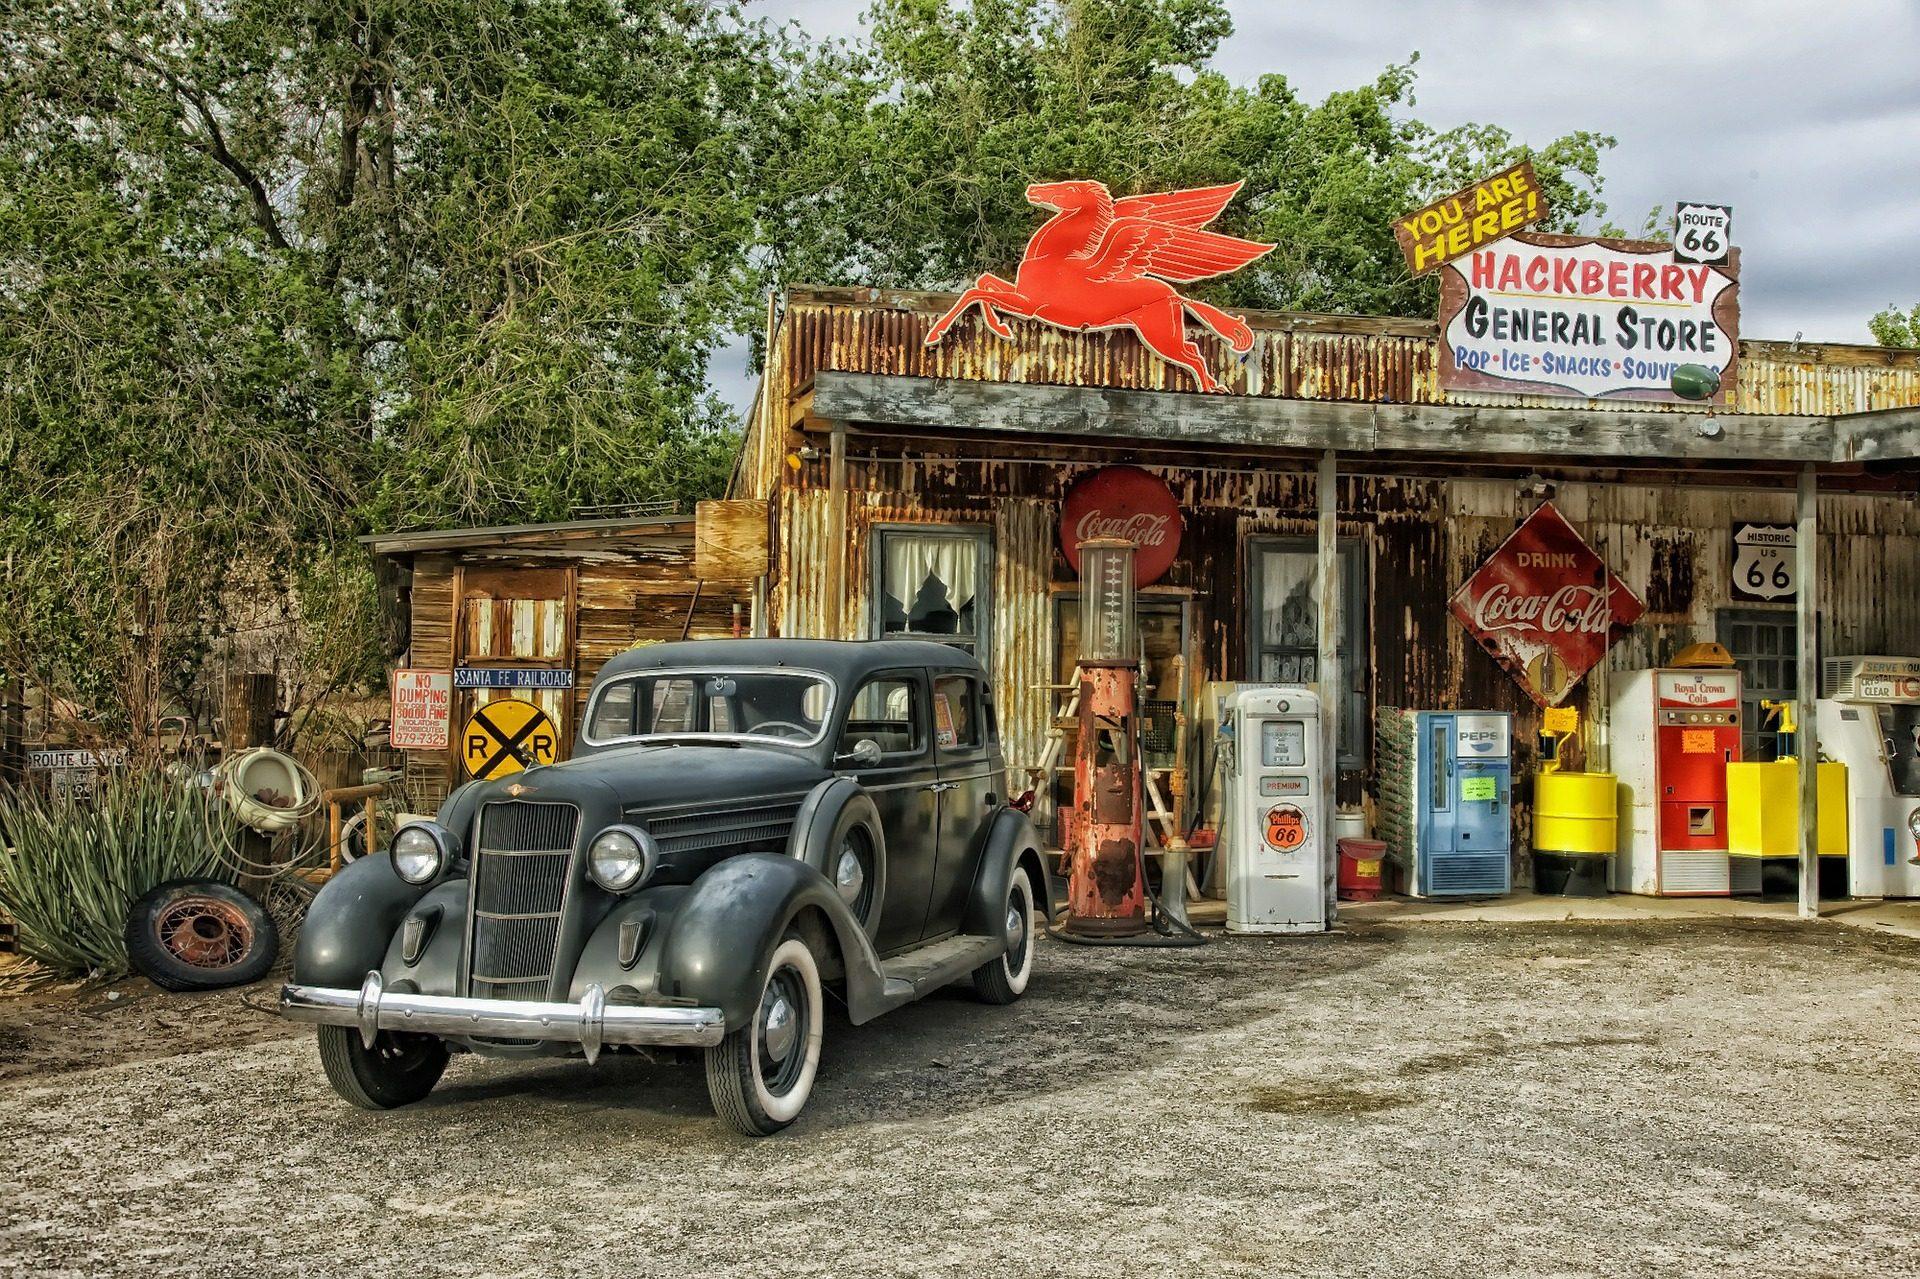 Auto, alt, Jahrgang, Tankstelle, Arizona, Strecke 66 - Wallpaper HD - Prof.-falken.com